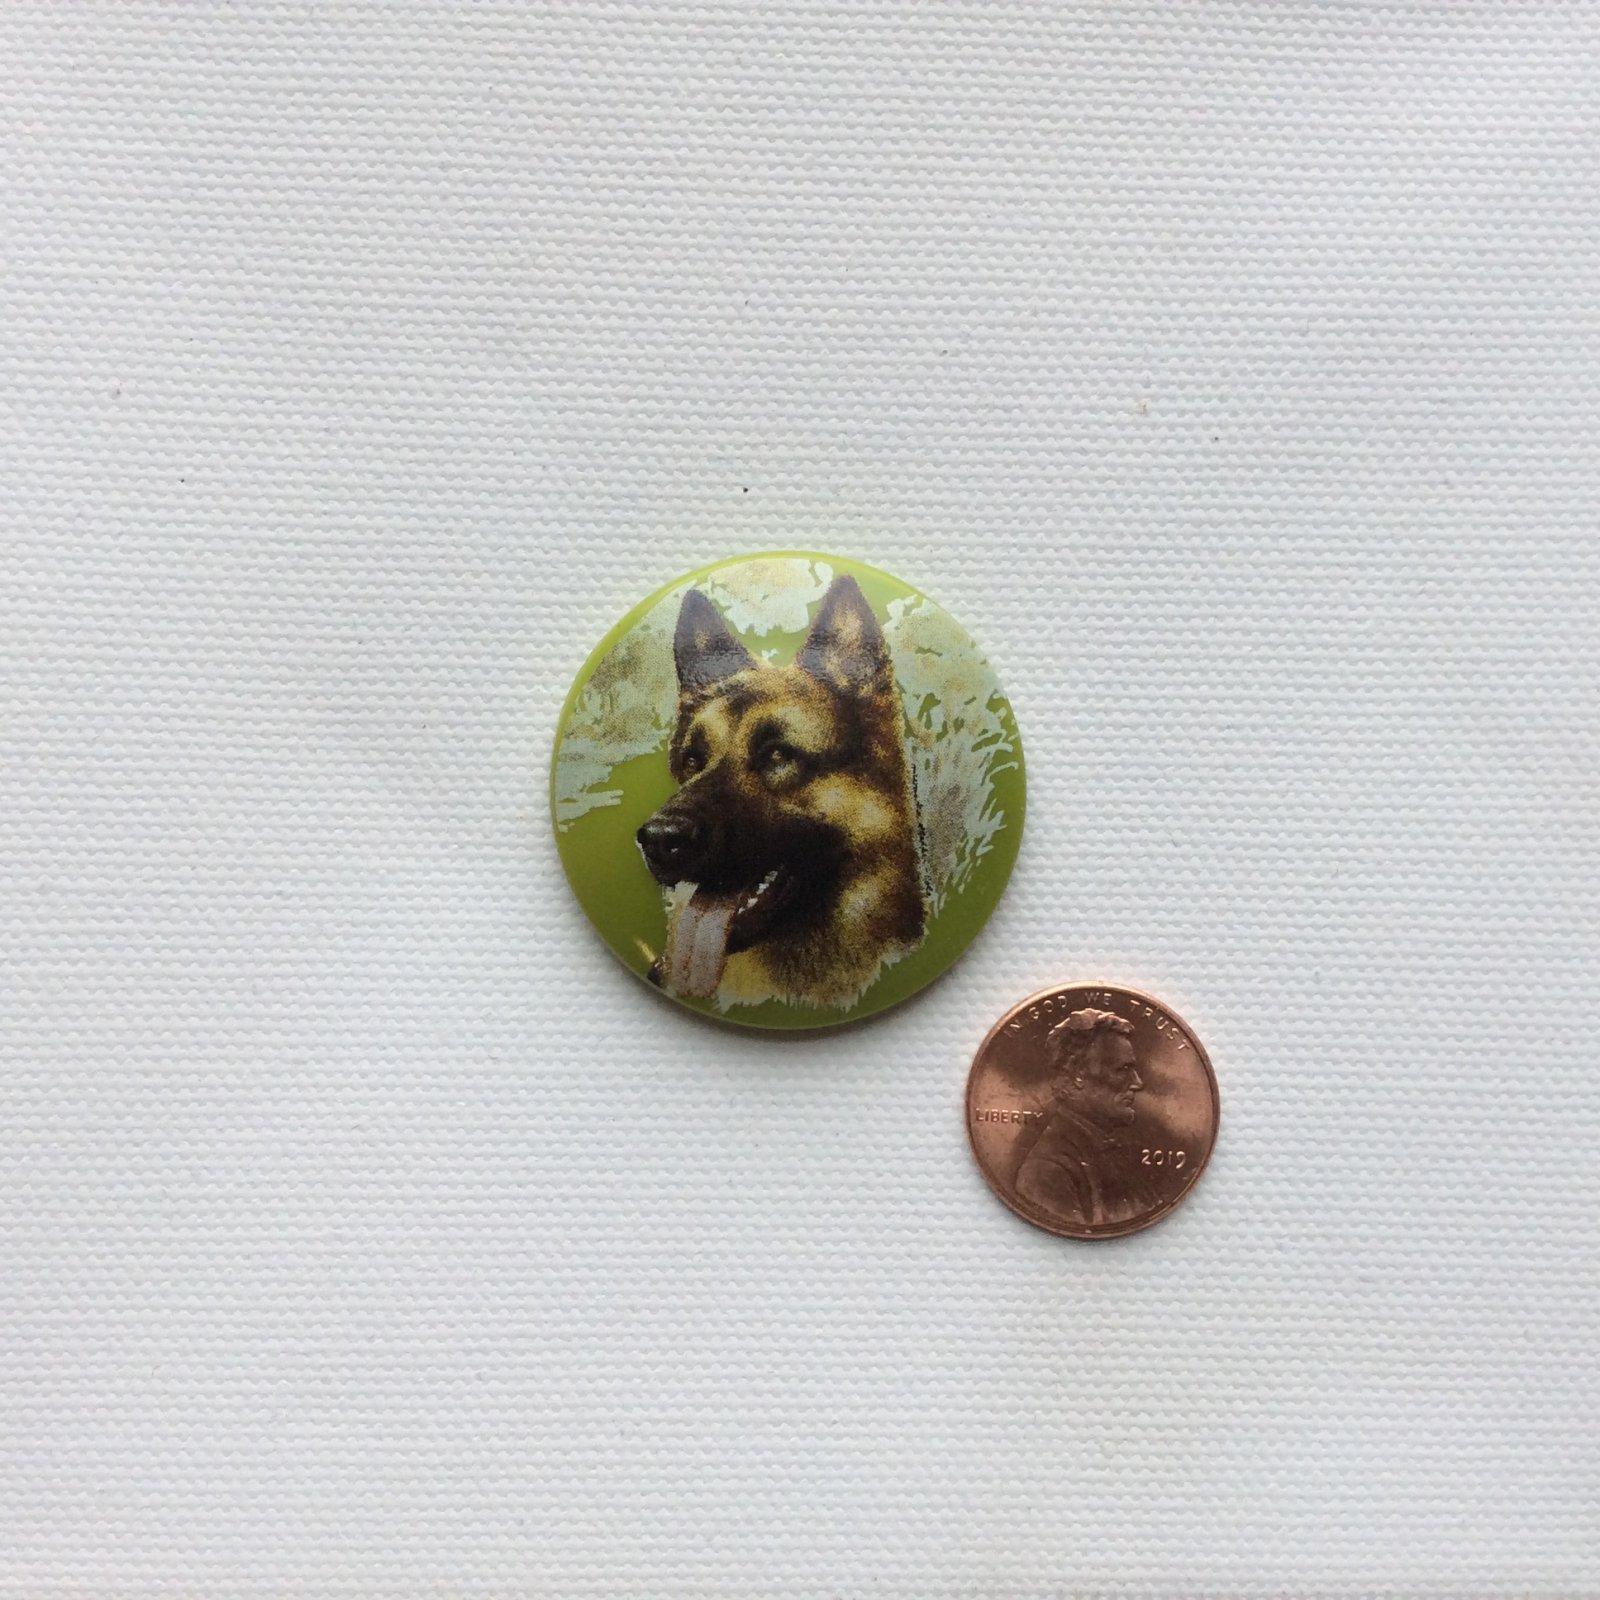 Czech Glass Hand Painted German Shepard Dog Breed Glass Sewing Button CZG25